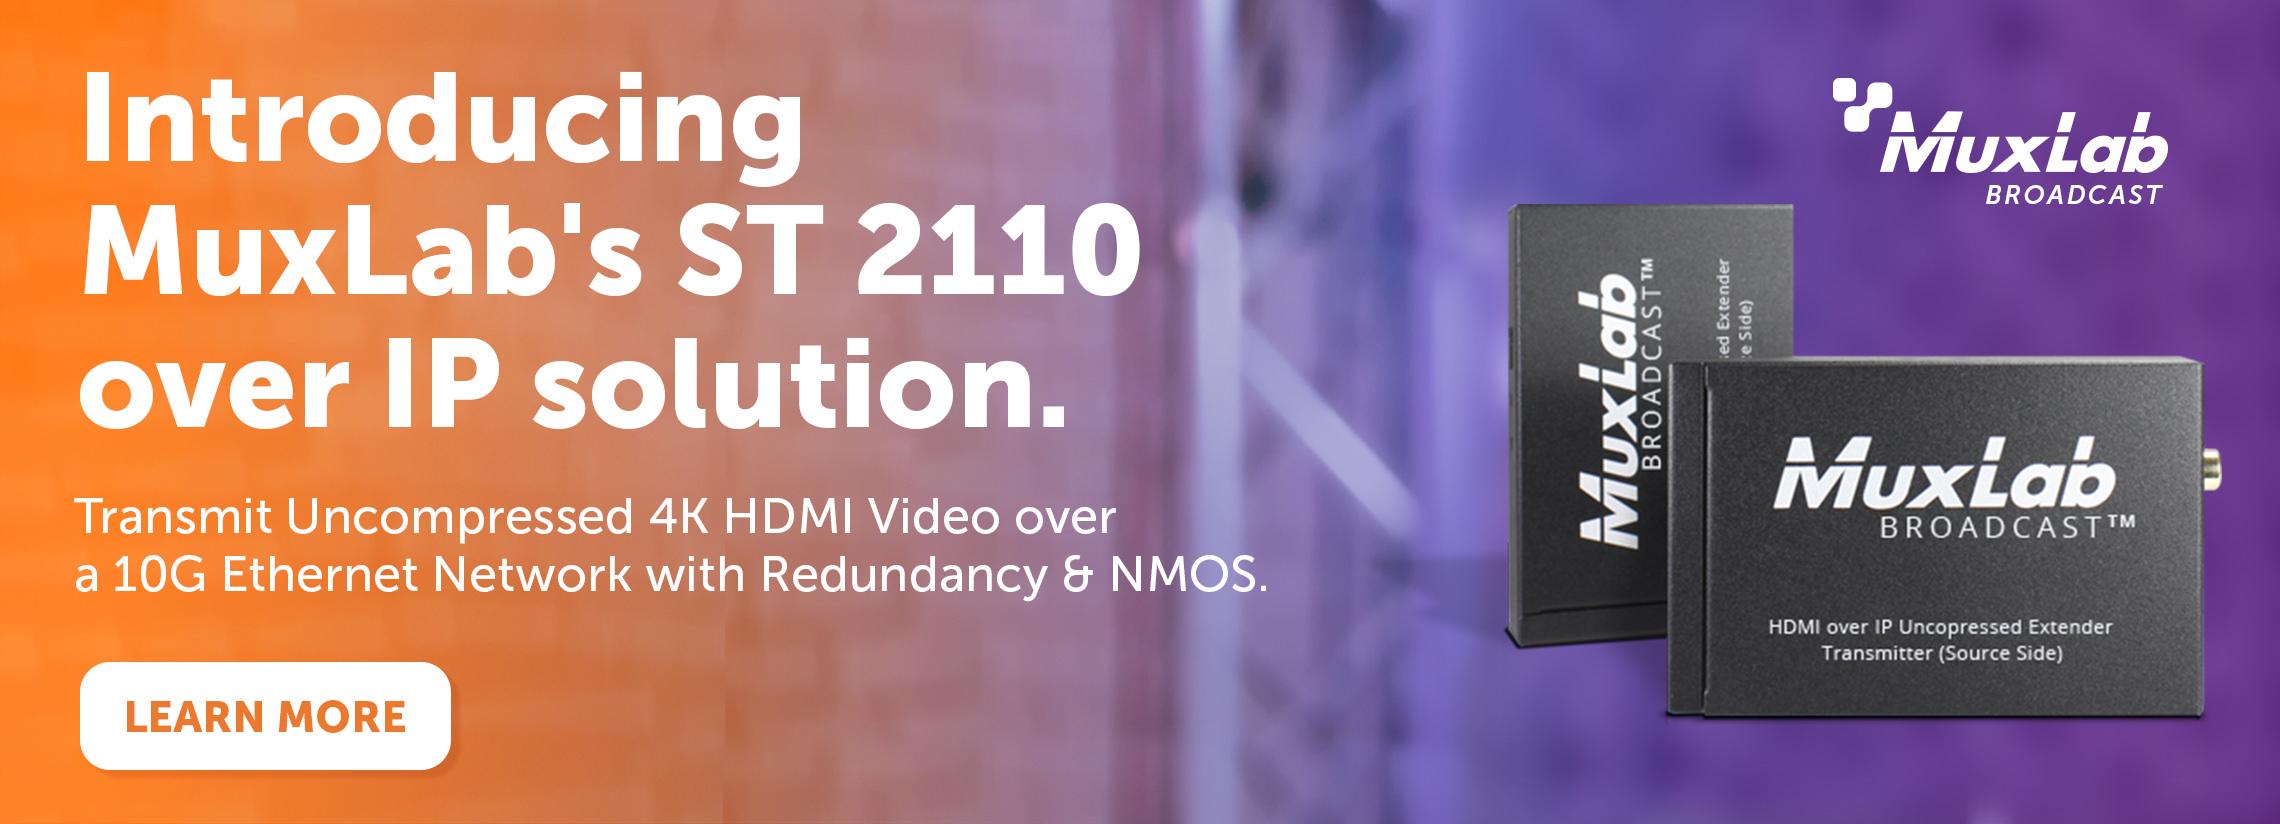 st-2110 av over ip solutions from muxlab